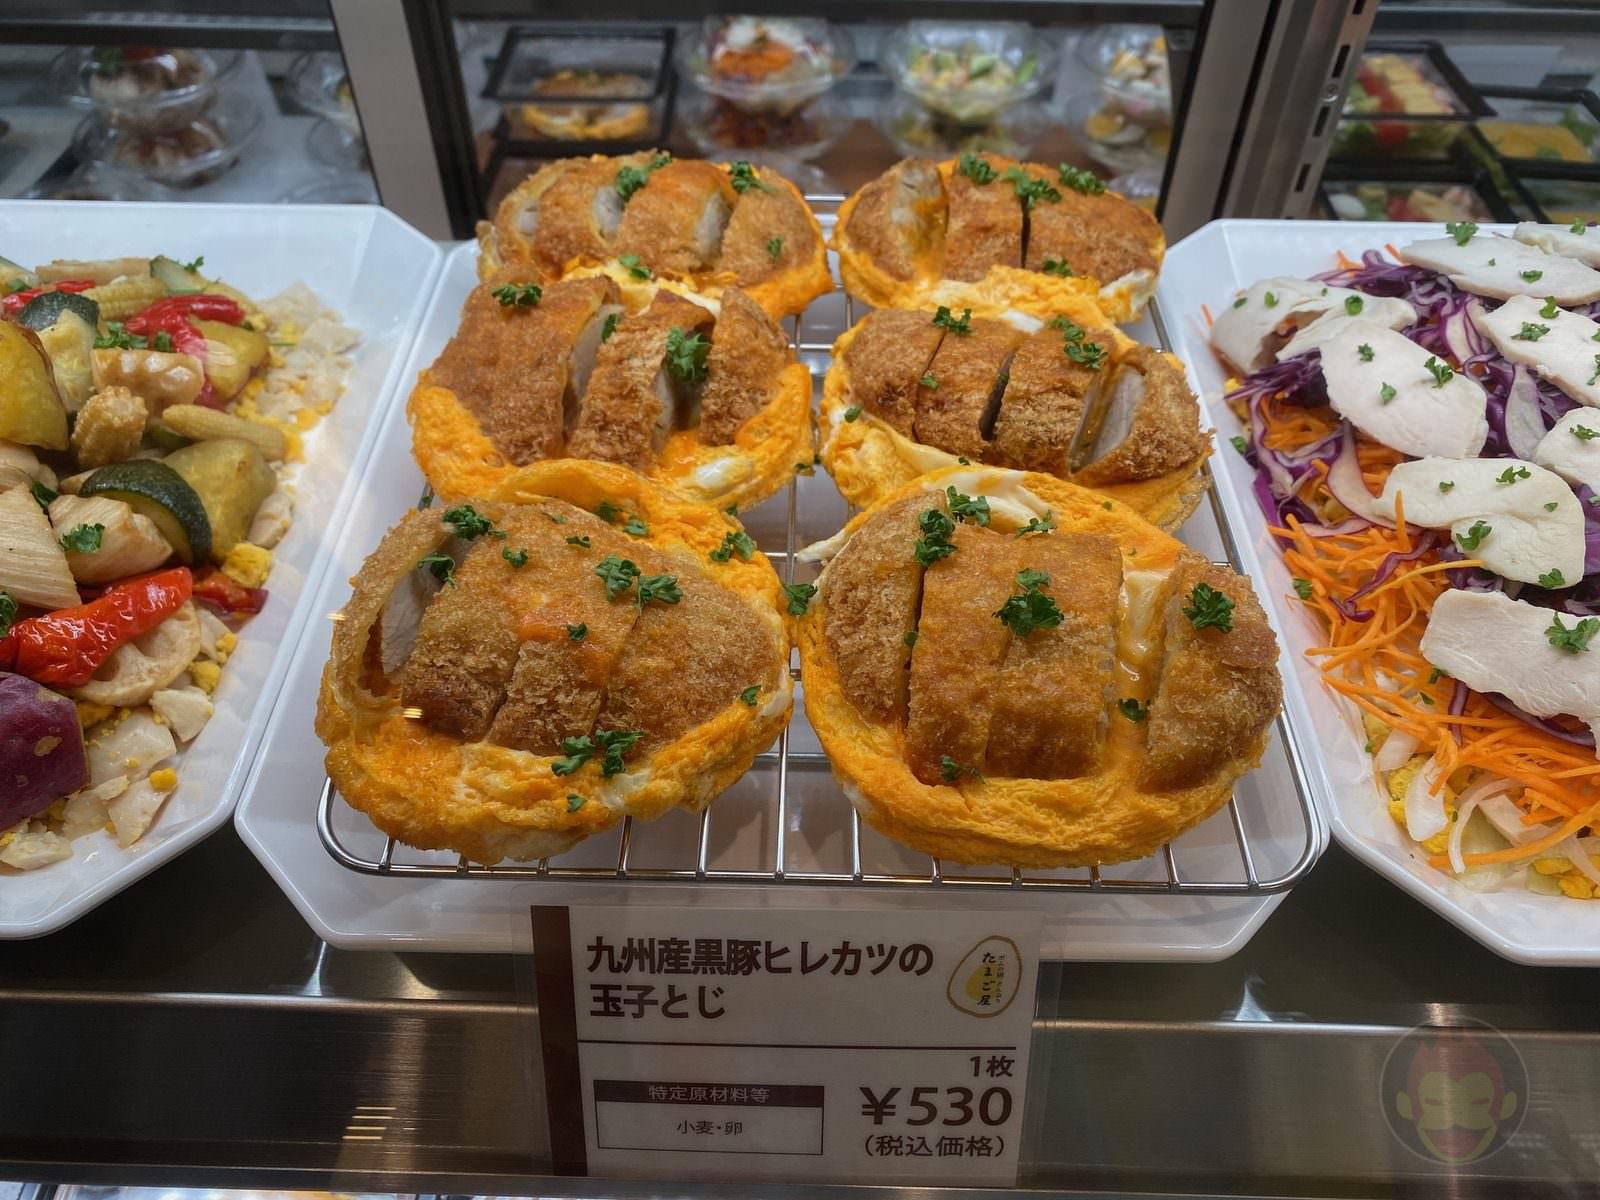 Shibuya-Scramble-Square-Food-I-Ate-110.jpeg